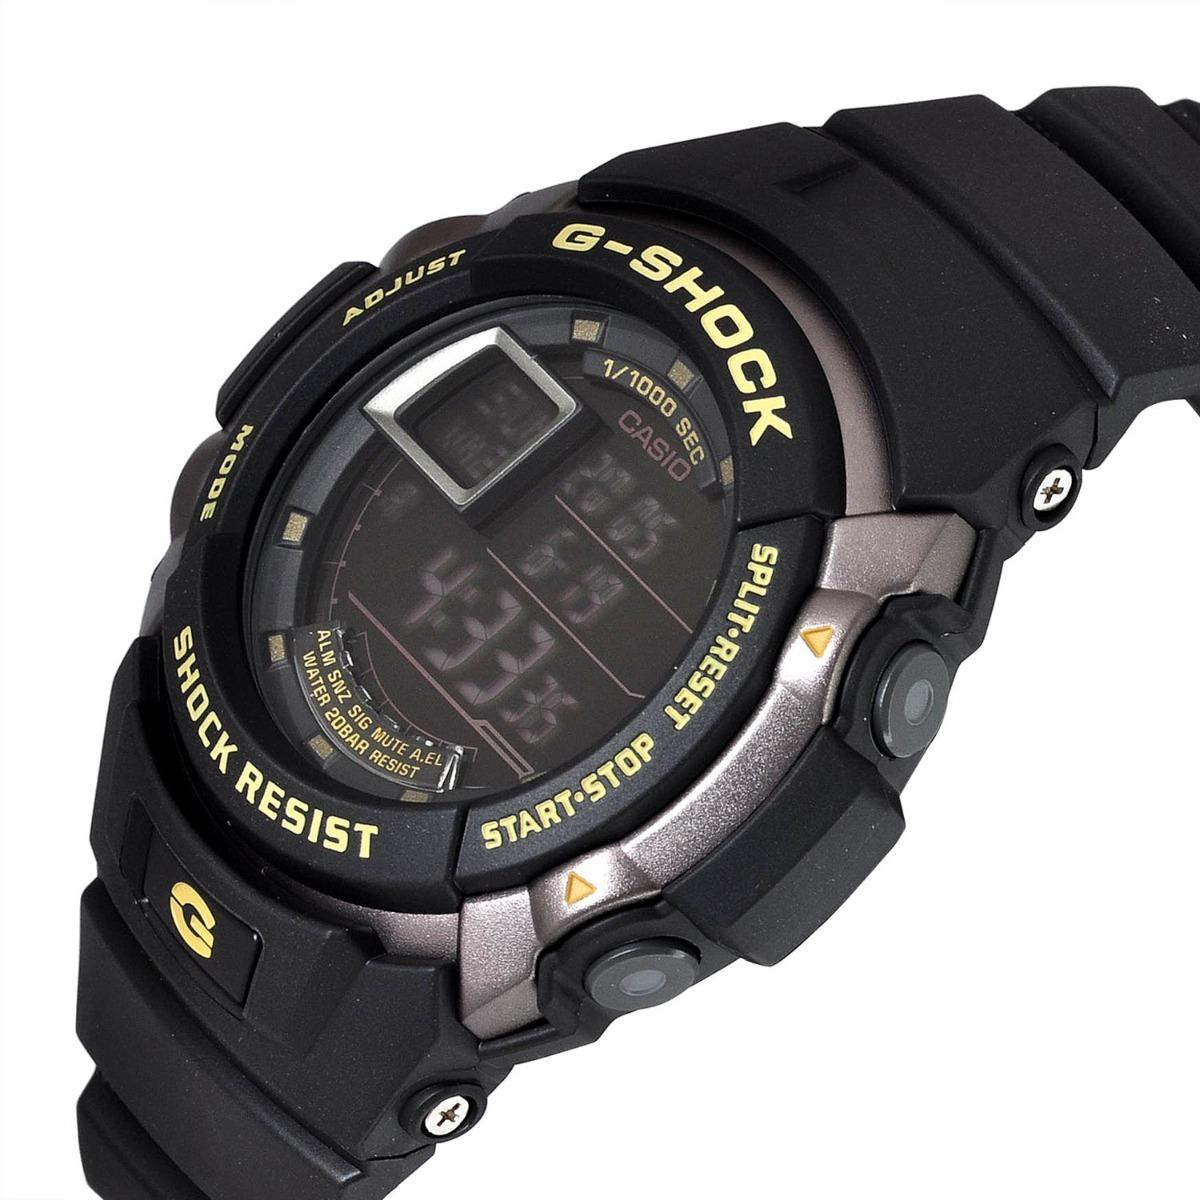 7710 Golpes Casio G Shock 200m Reloj Resiste Vibraciones QthrCxsdB